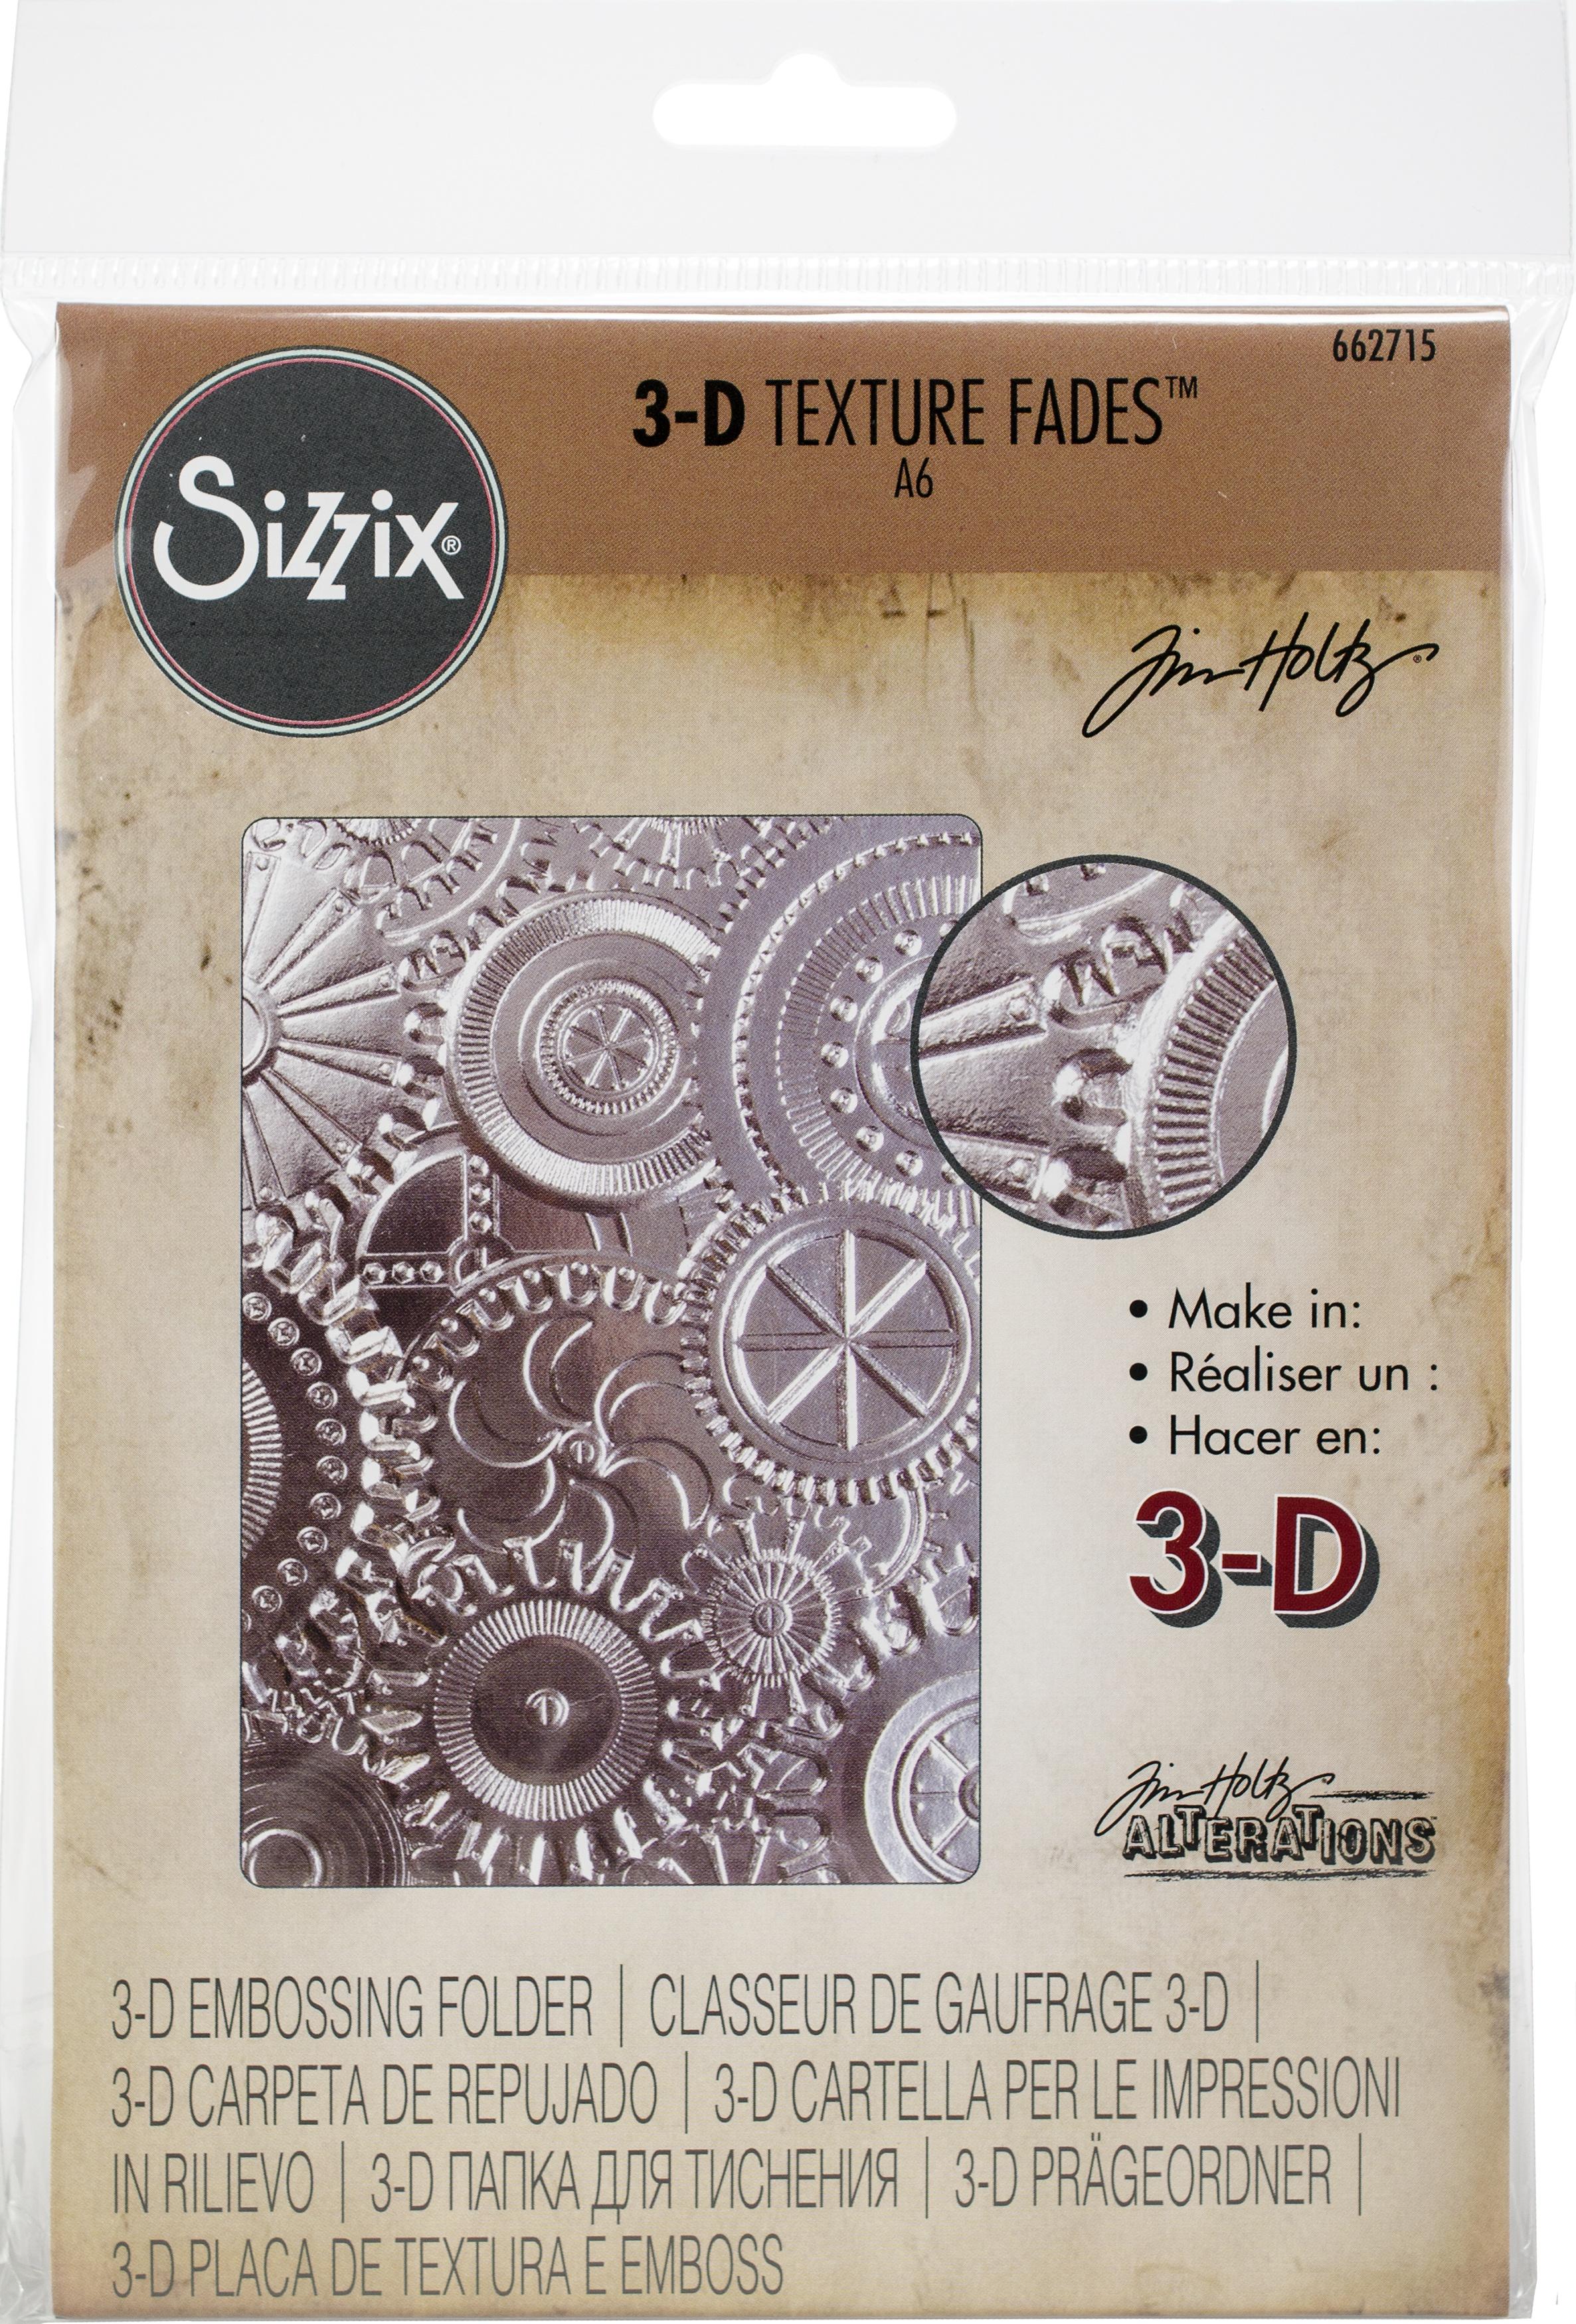 Sizzix 3D Texture Fades Embossing Folder By Tim Holtz-Mechanics